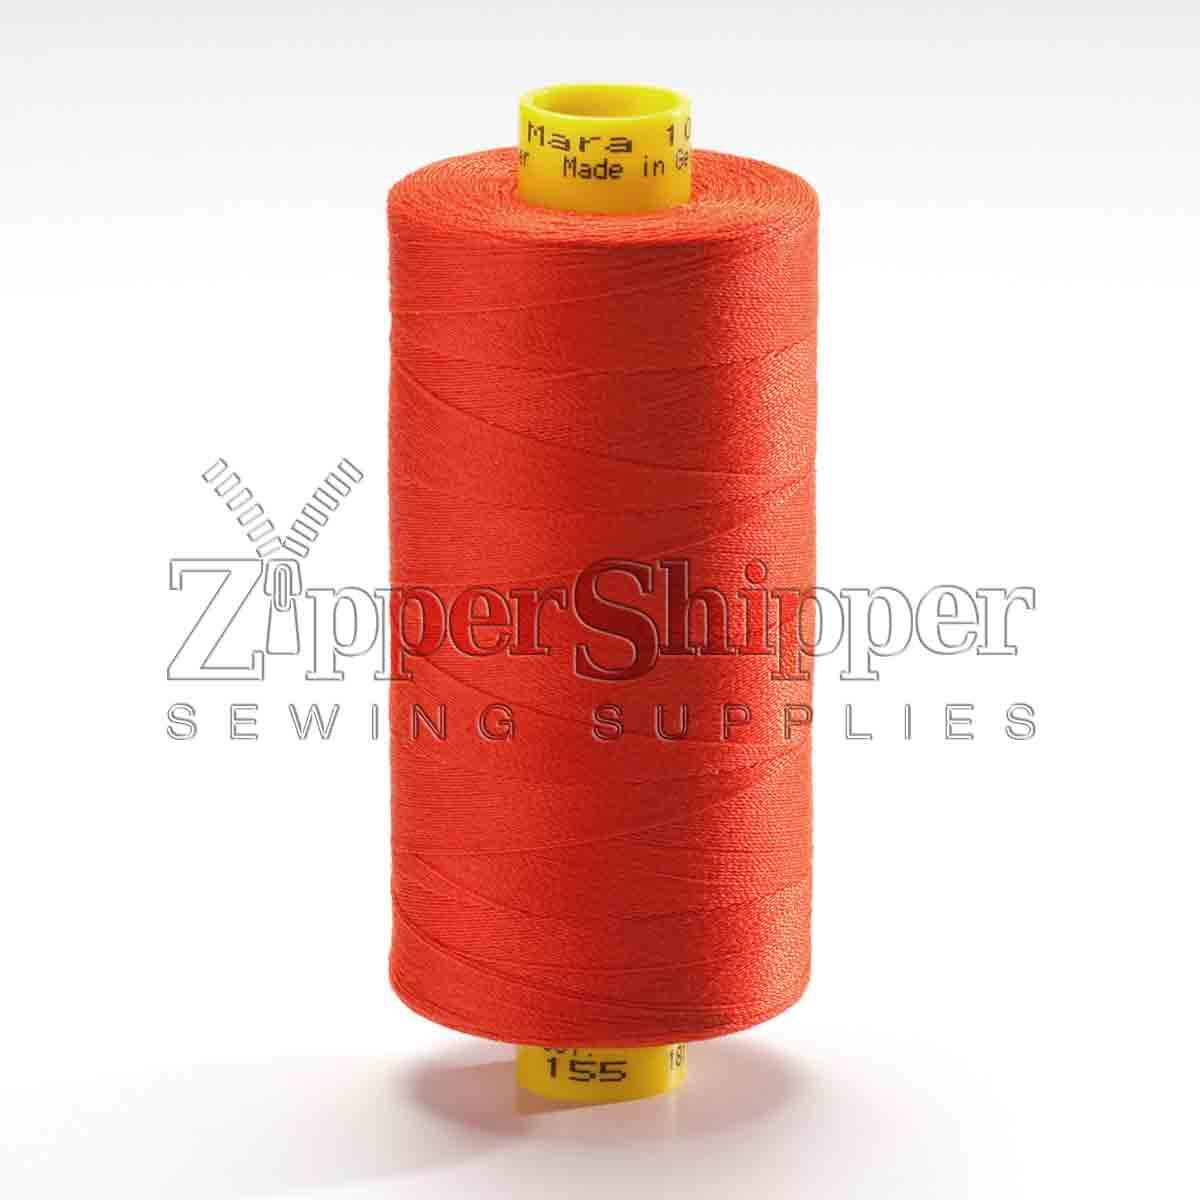 gutermann mara thread 1094 yards - Gutermann Thread Color Chart